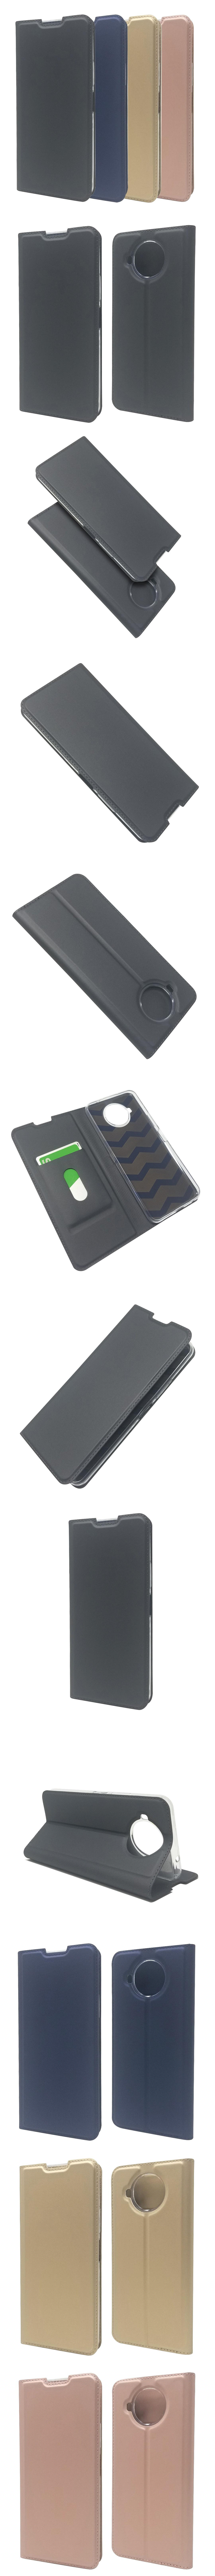 299-Nokia-極致超薄隱藏磁鐵手機套皮套(Nokia 8.3)